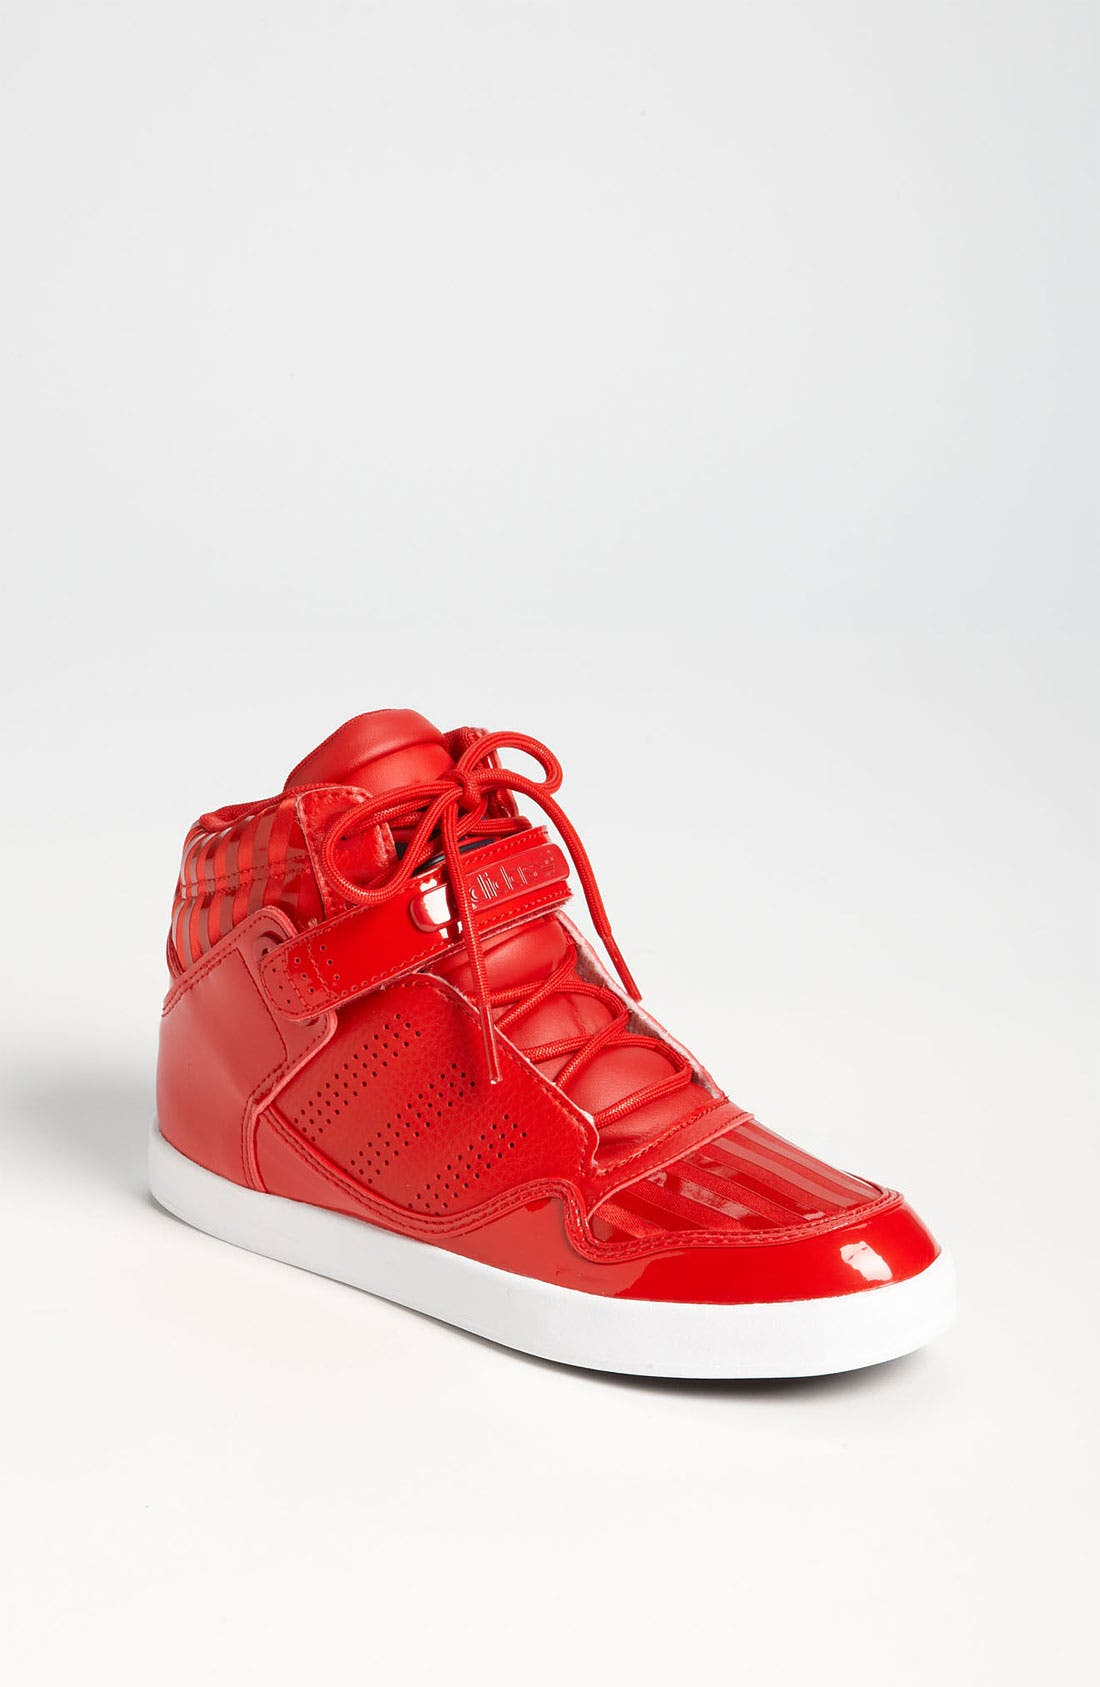 Main Image - adidas 'AR 2.0' Sneaker (Big Kid)